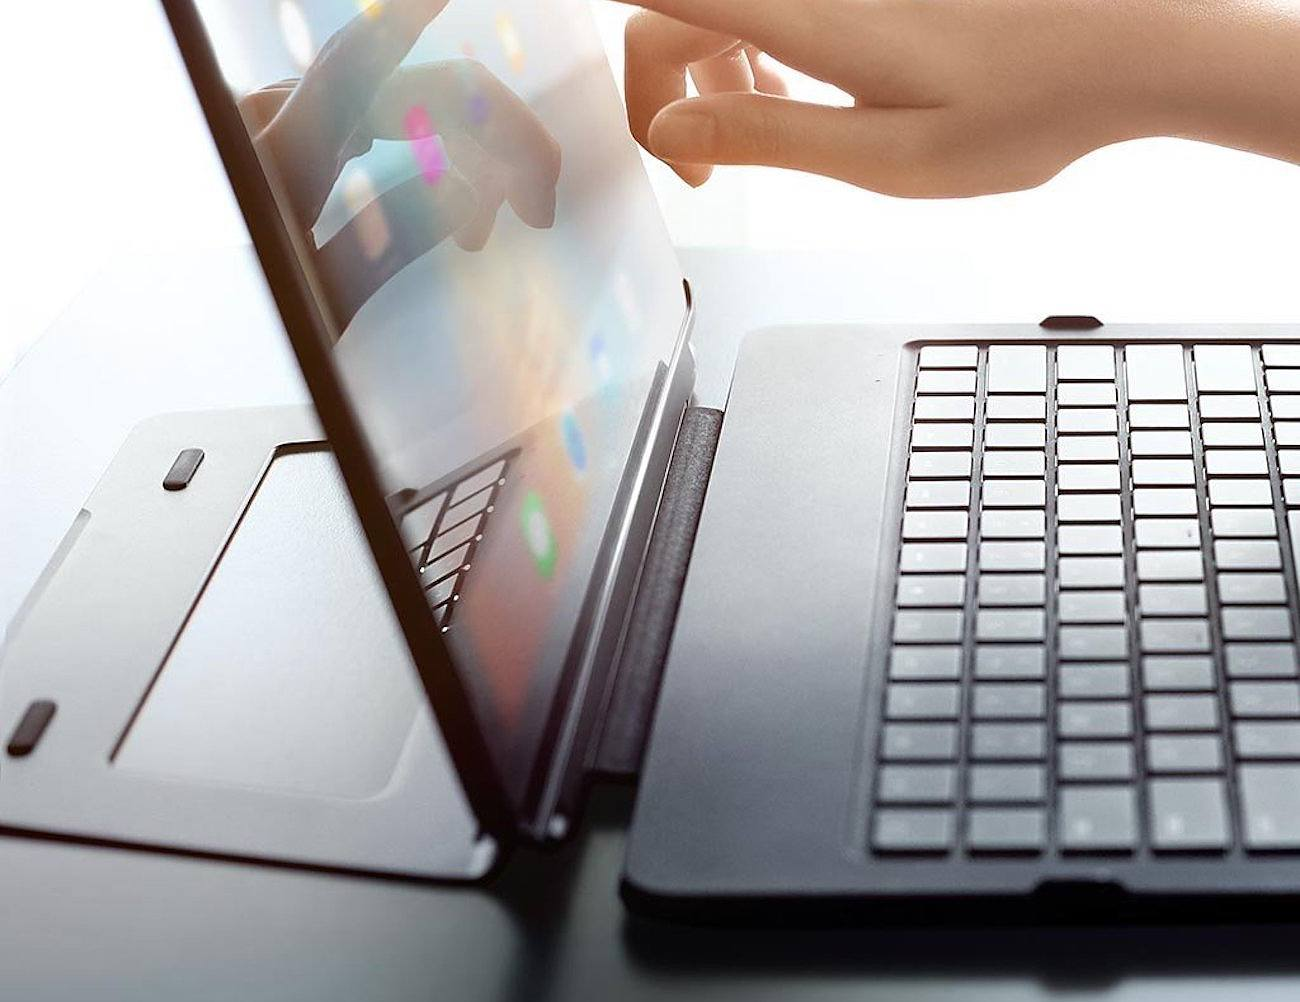 Razer Mechanical Keyboard Case for Apple iPad Pro